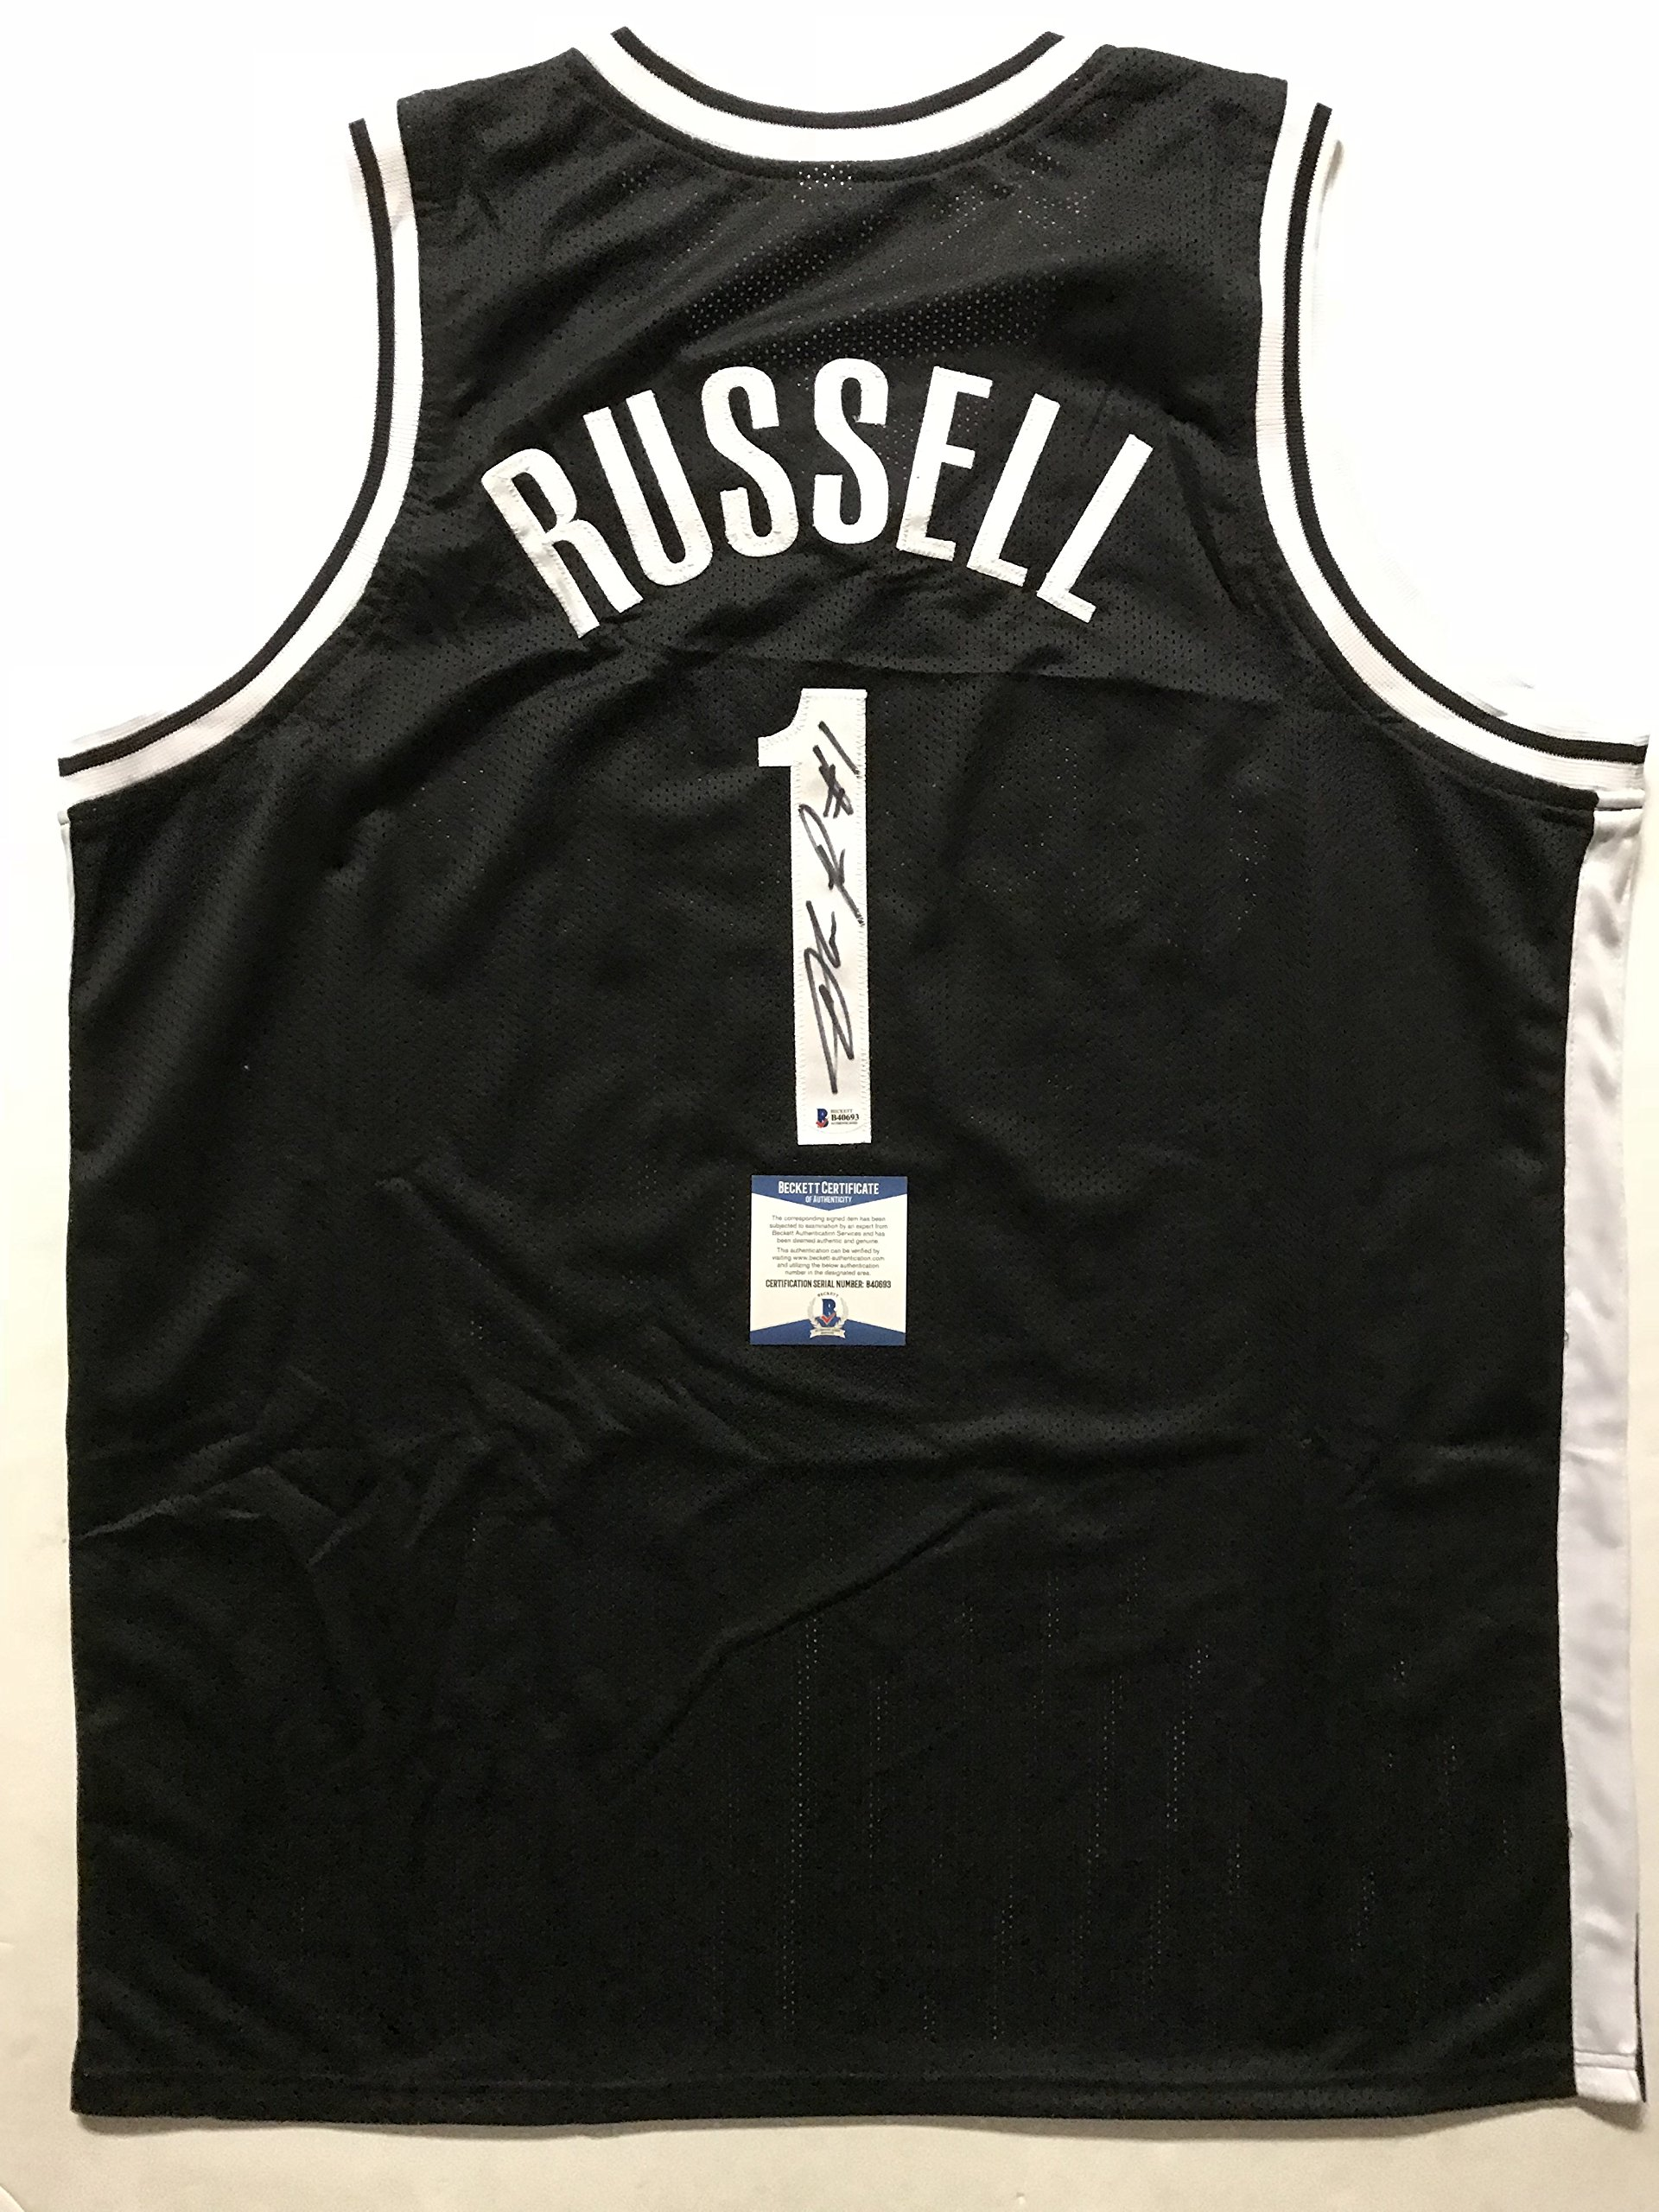 Autographed/Signed D'Angelo Russell Brooklyn Black Basketball Jersey Beckett BAS COA